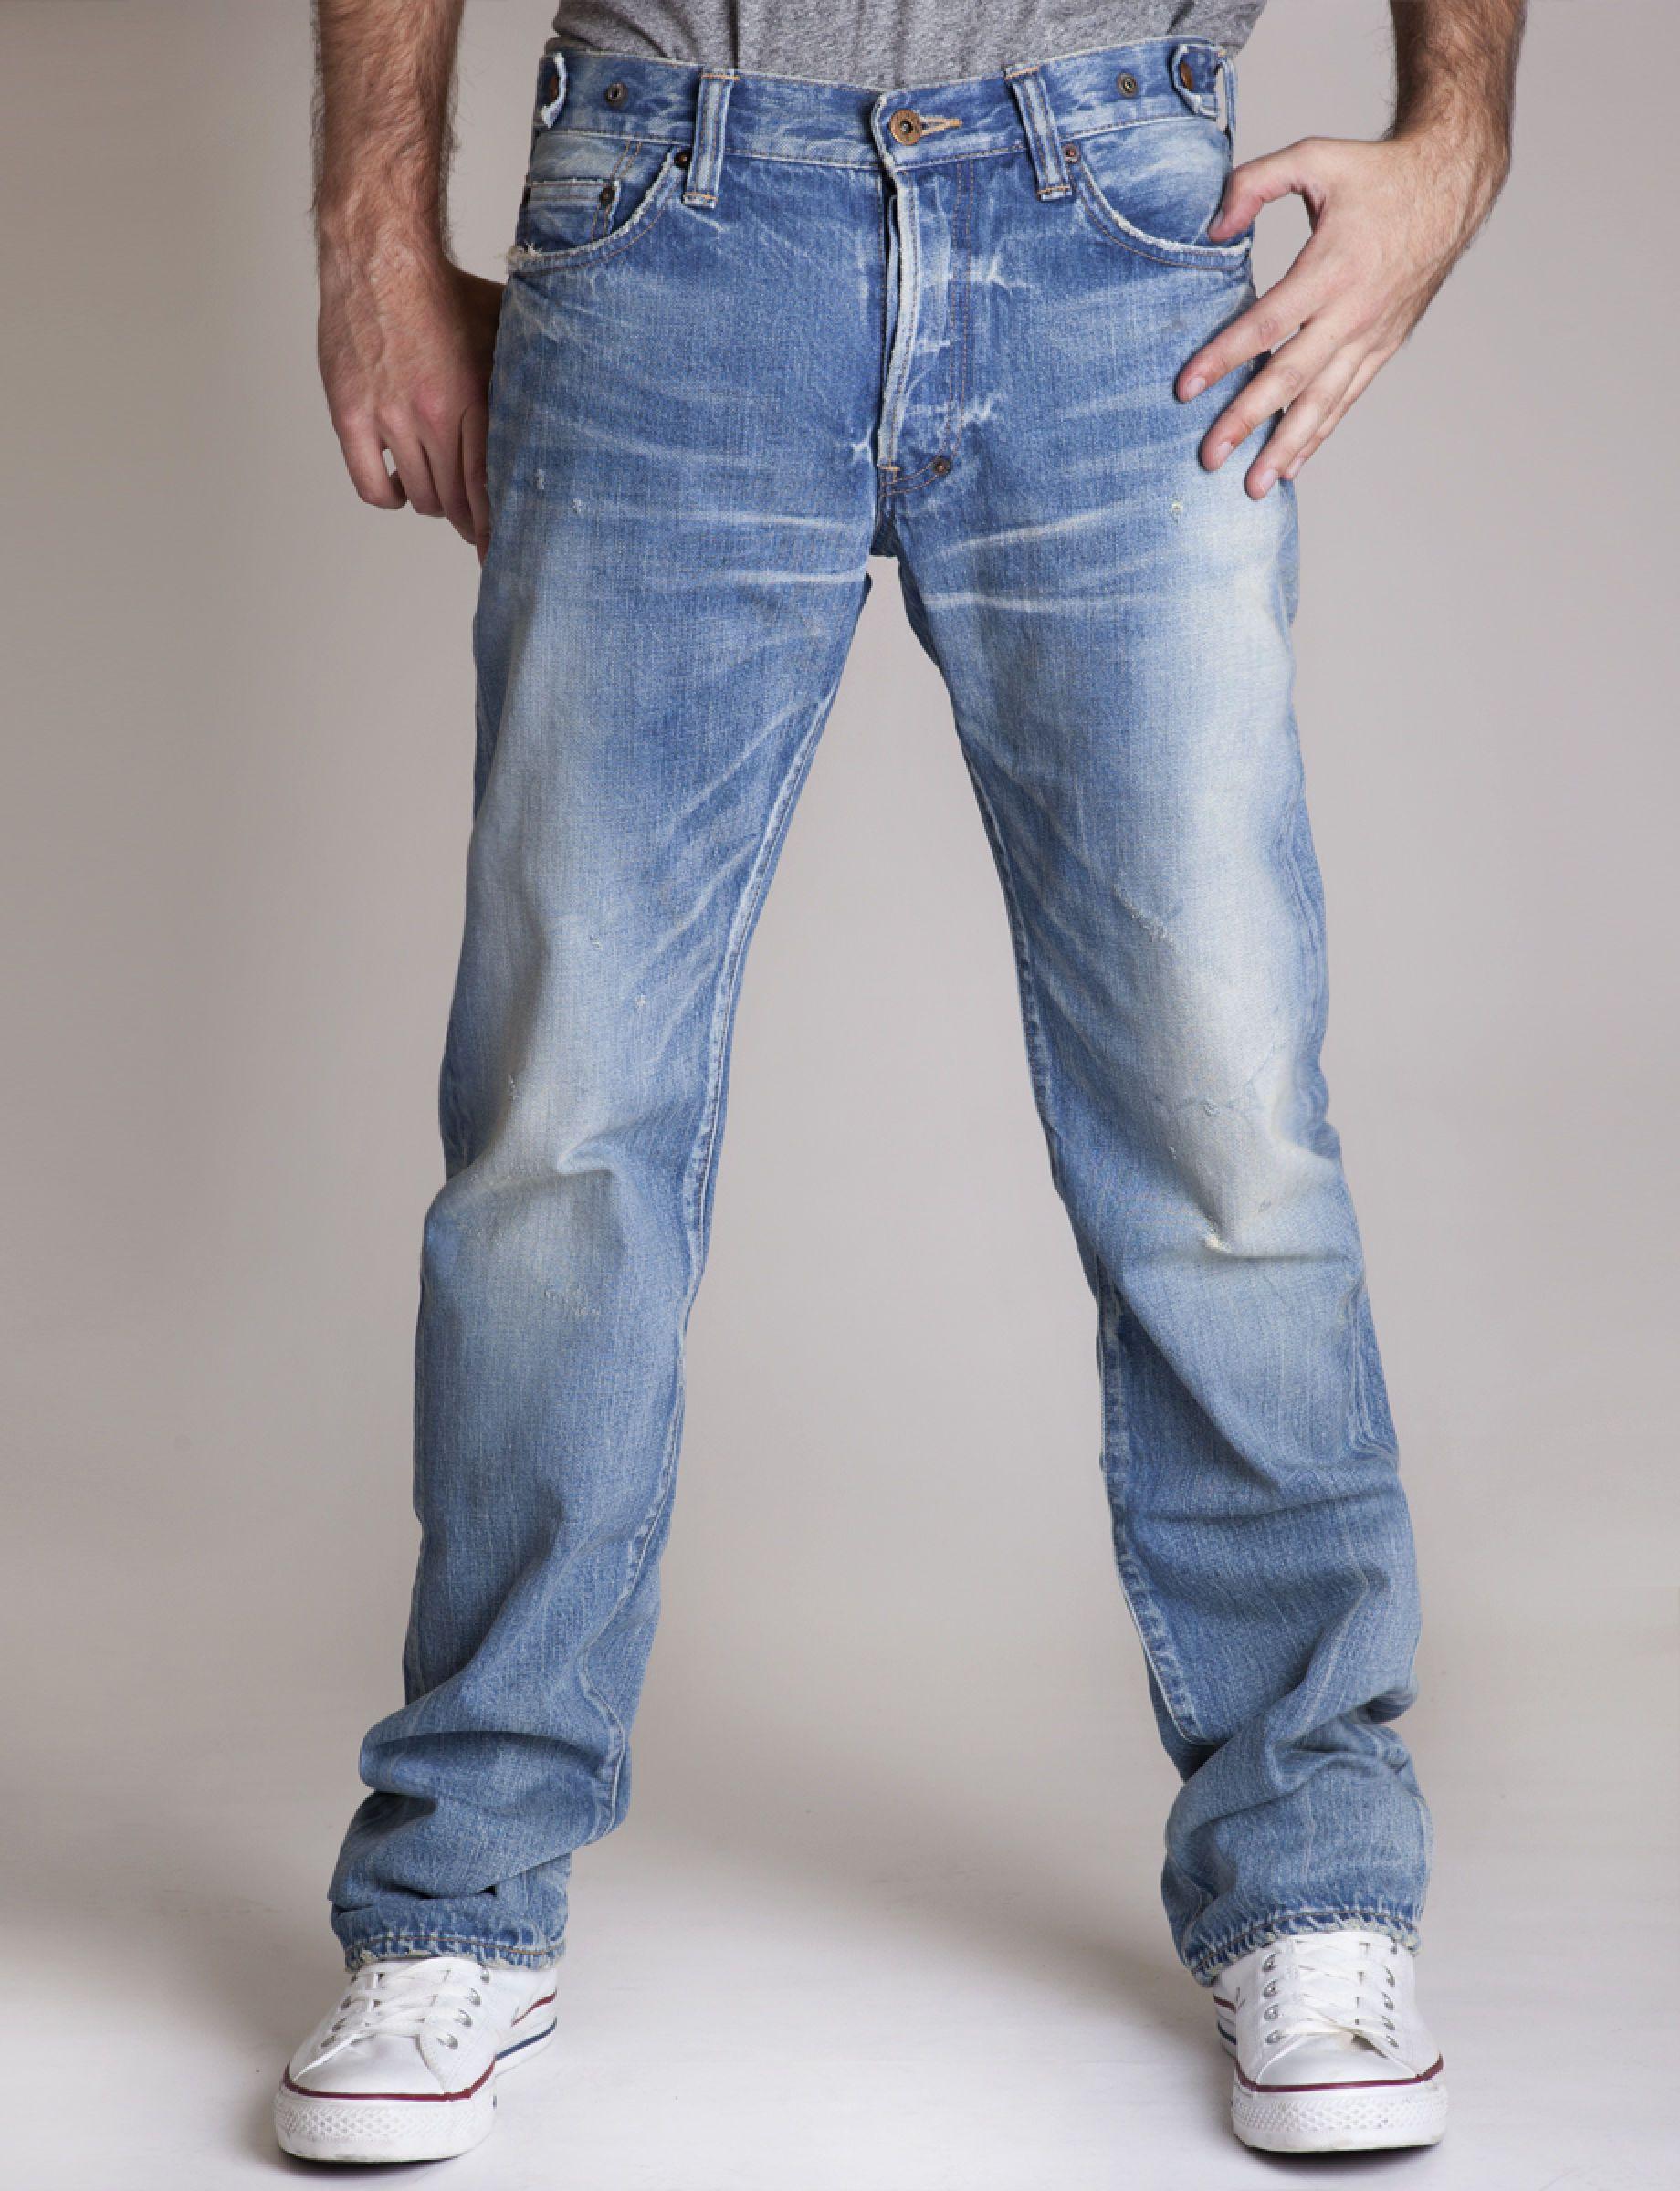 55dfe0458ce2a PRPS - FOIDEL CREEK   Selvedge Jeans   Japanese Denim   Jeans   Prps Jeans